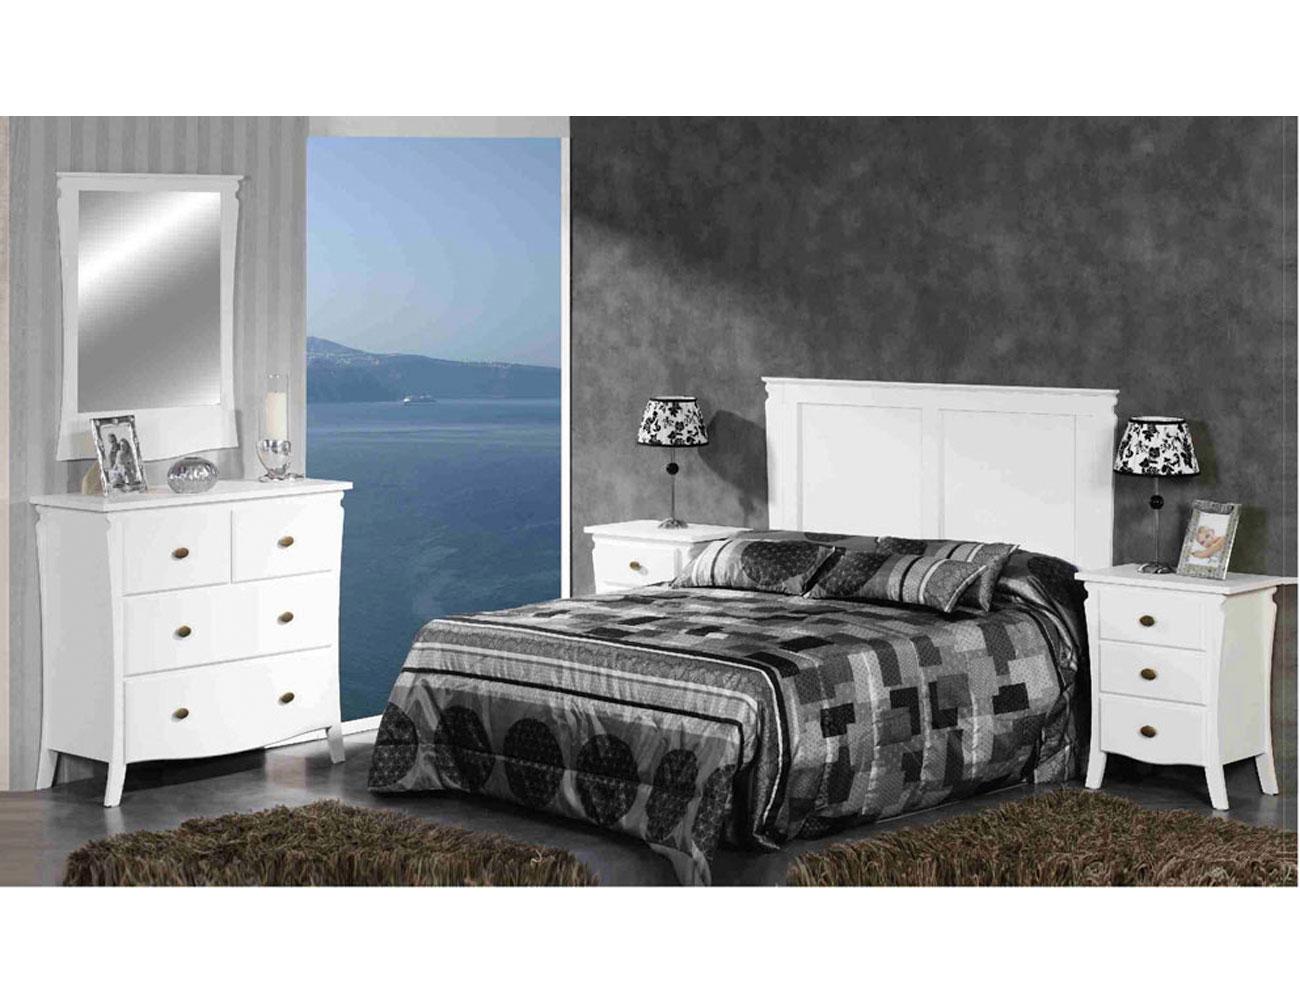 Dormitorio matrimonio blanco lacado madera dm6